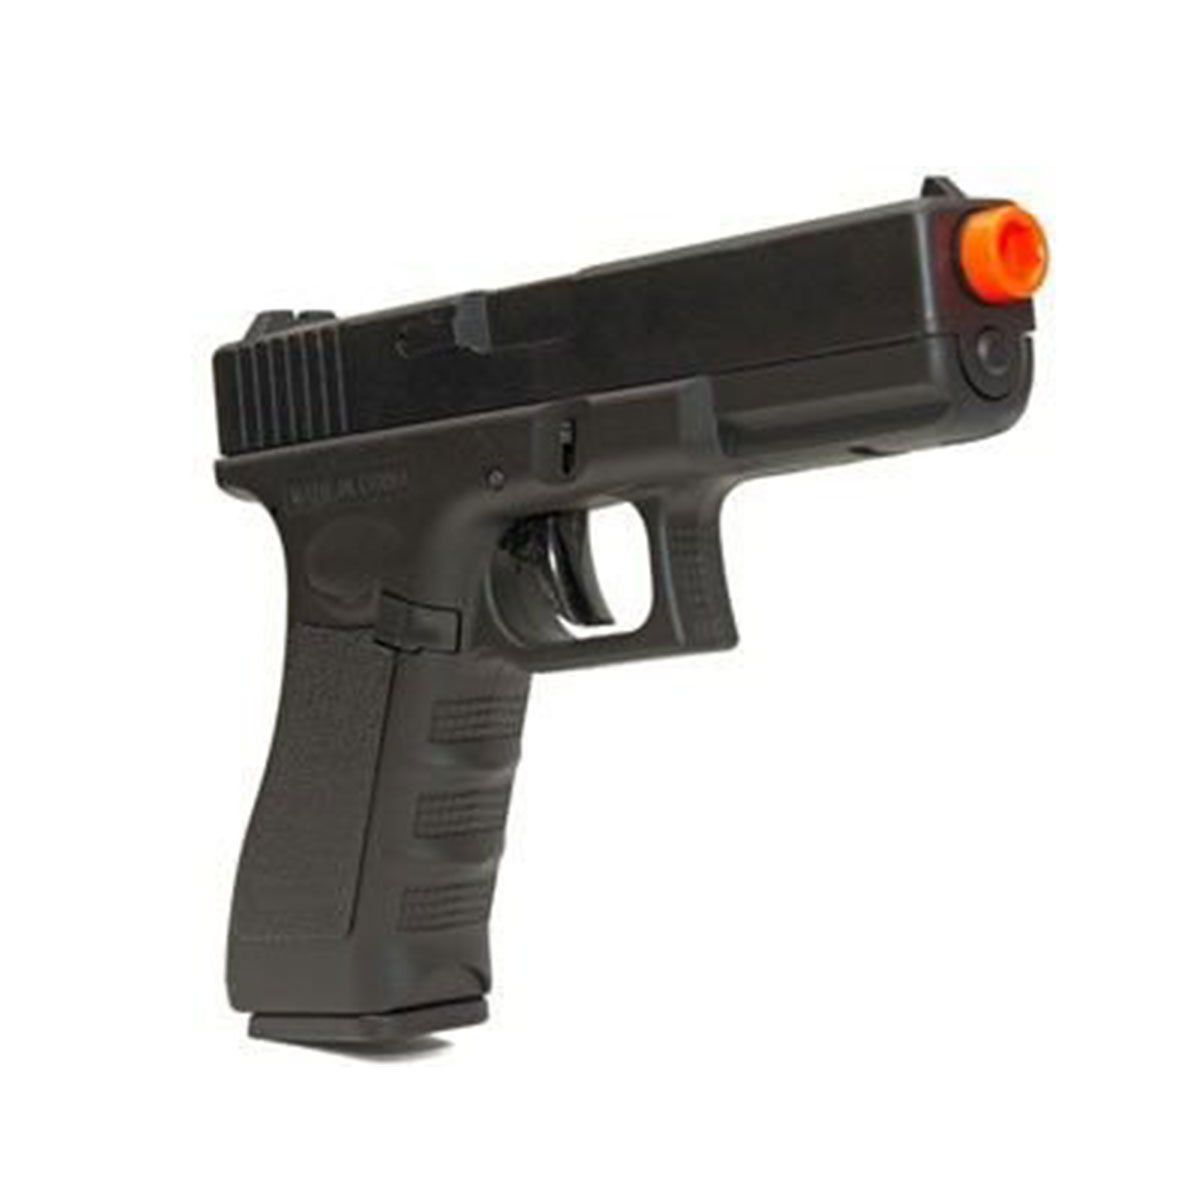 Pistola Airsoft Cyma Glock G18C CM030 Elétrica Bivolt 6mm